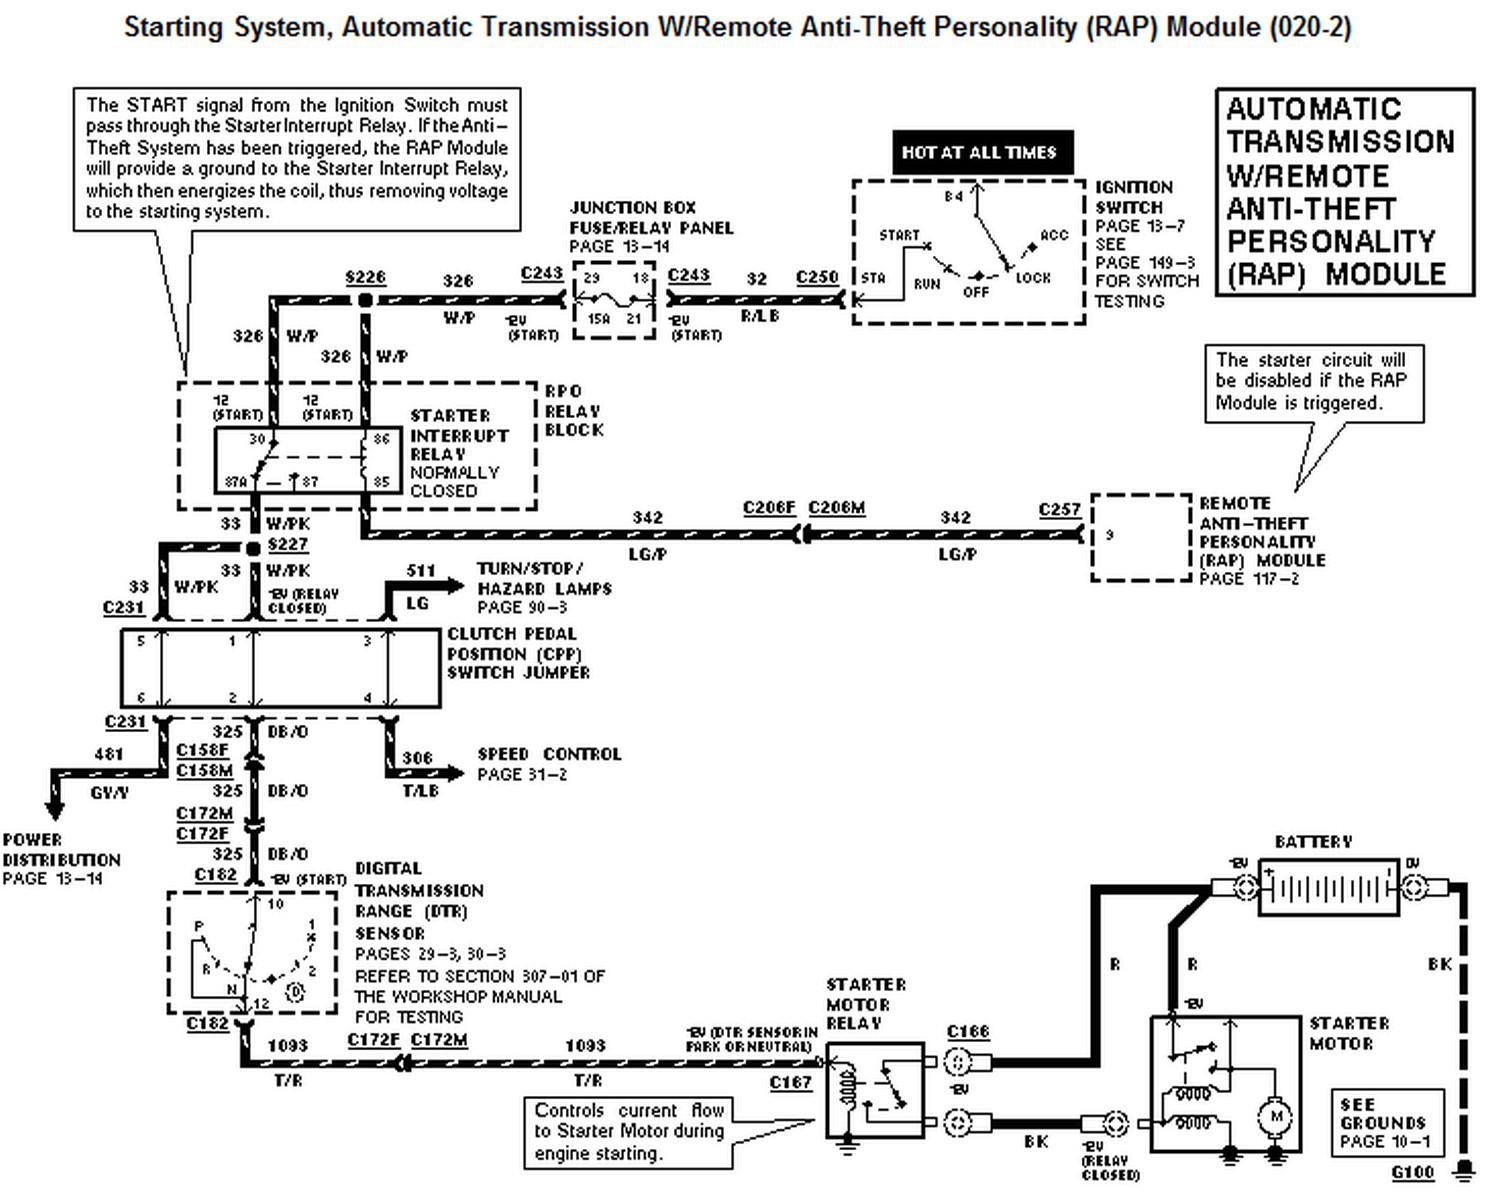 1990 Ford F 150 Ignition Switch Wiring Diagram Wiring Diagrams Site Popular A Popular A Geasparquet It